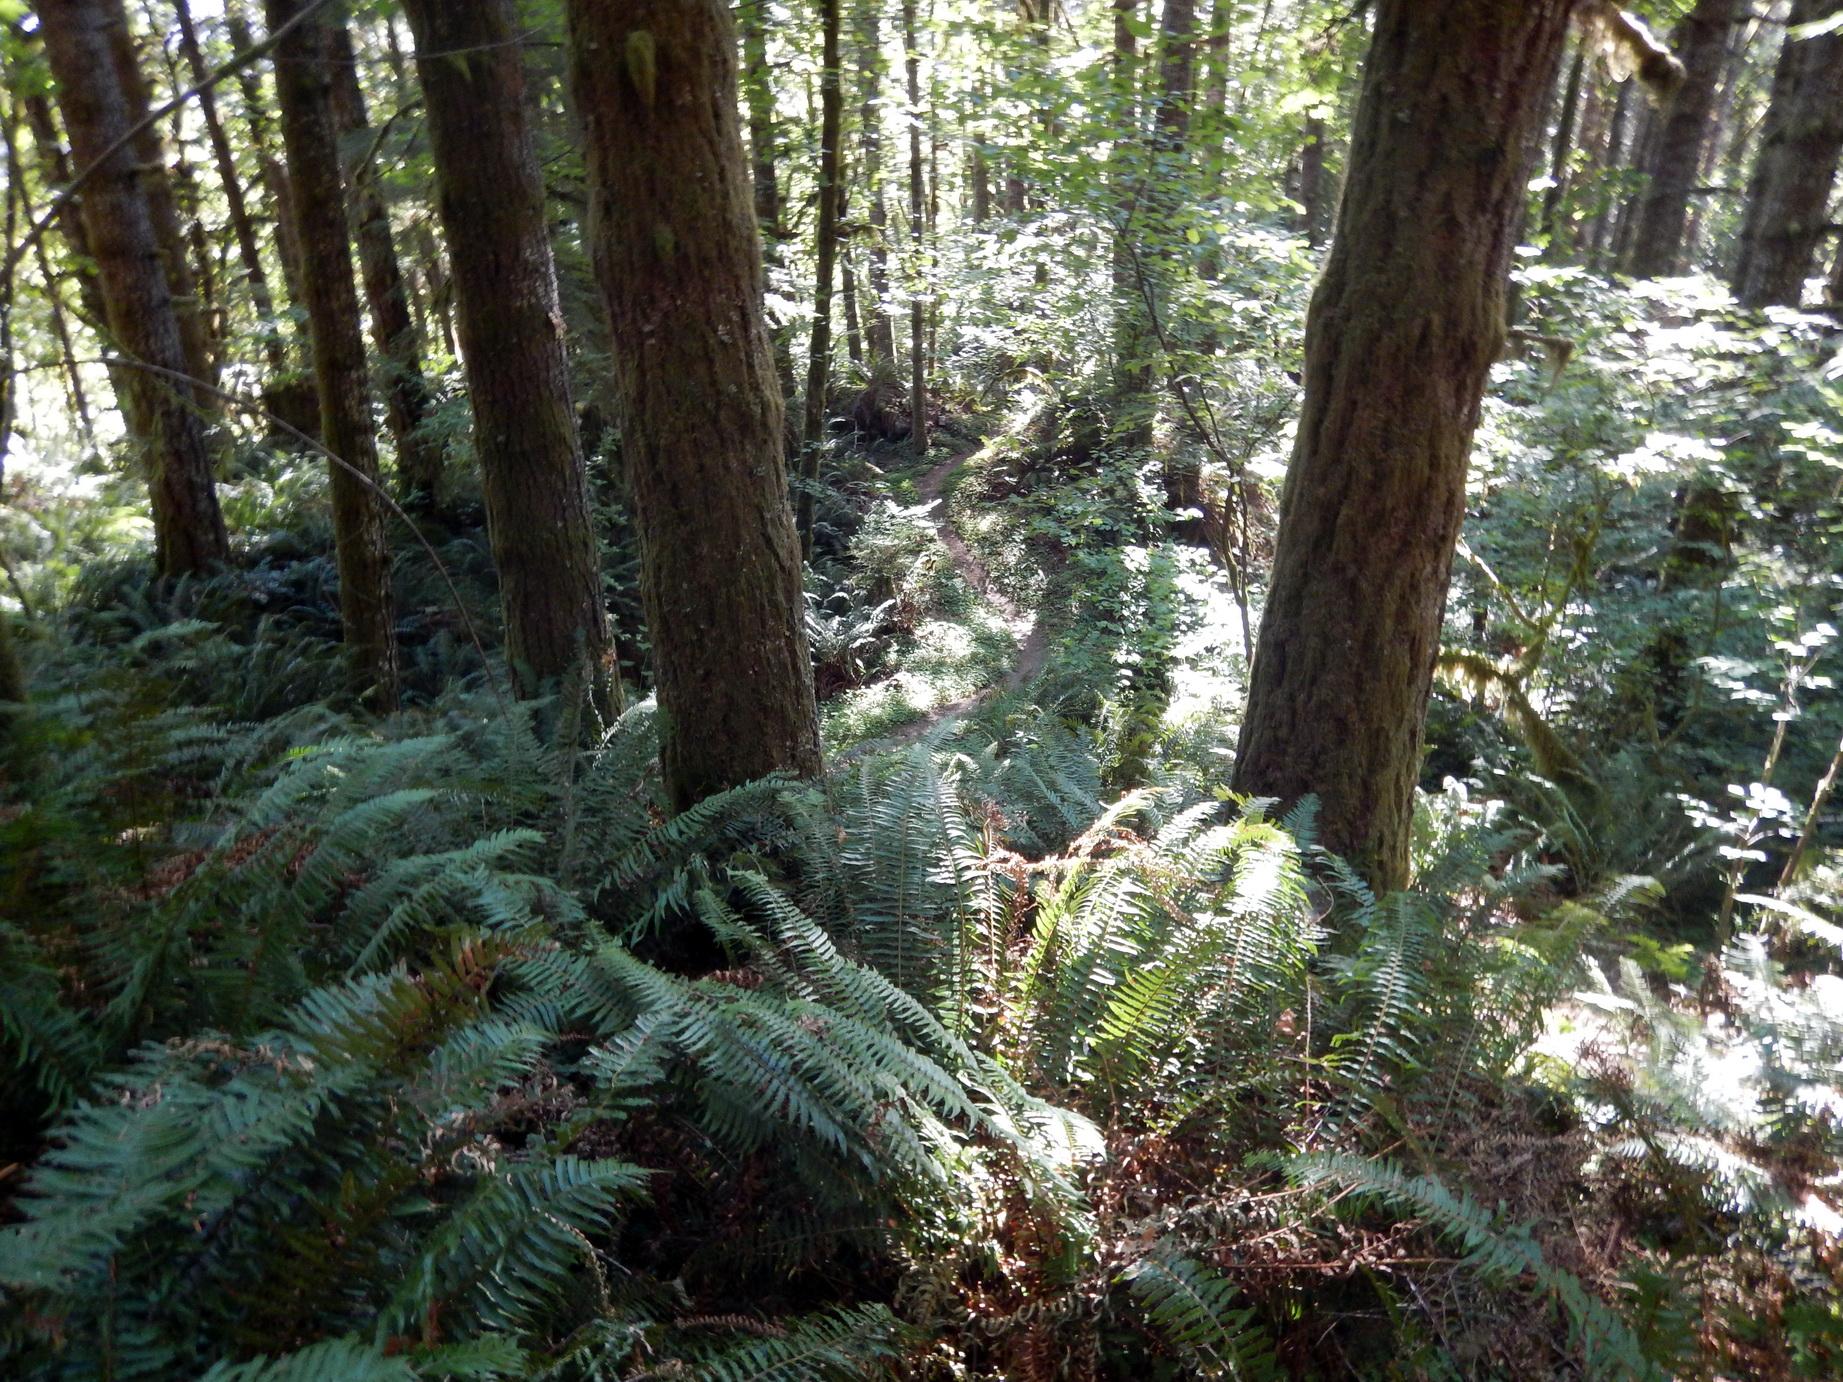 Verdant scene along the Old Growth Ridge Trail